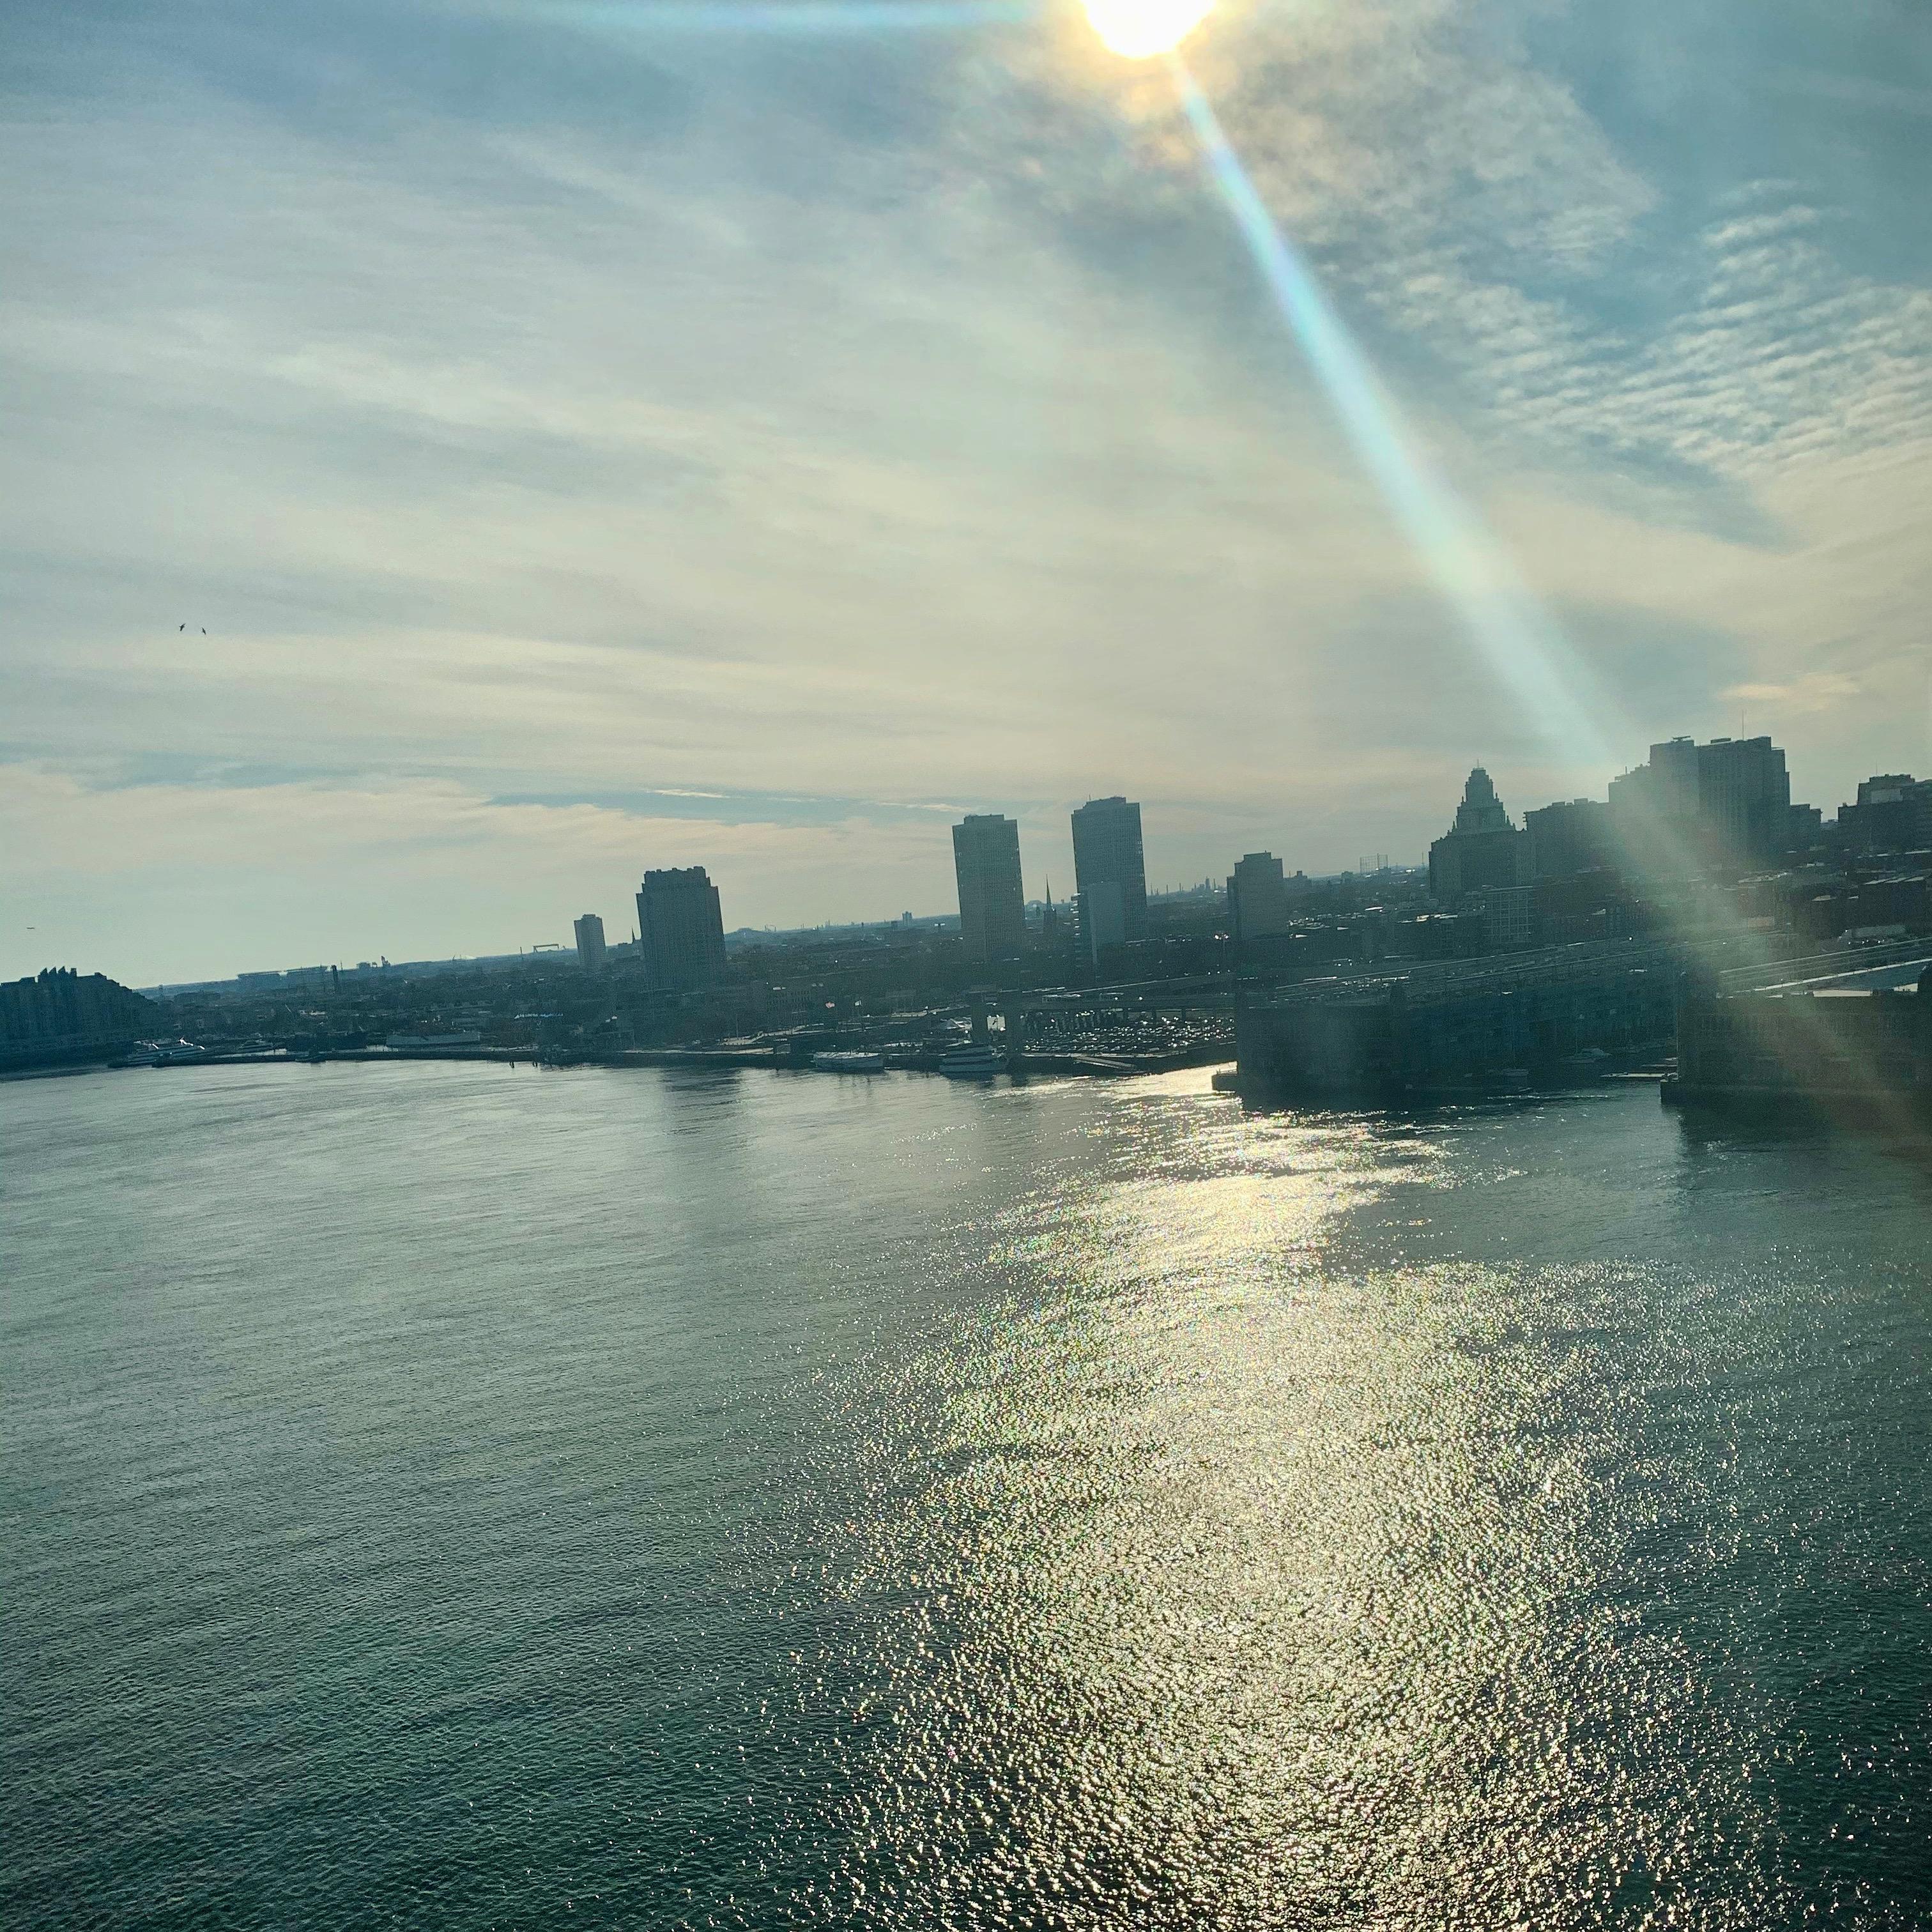 Philadelphia from Patco train, February 2020